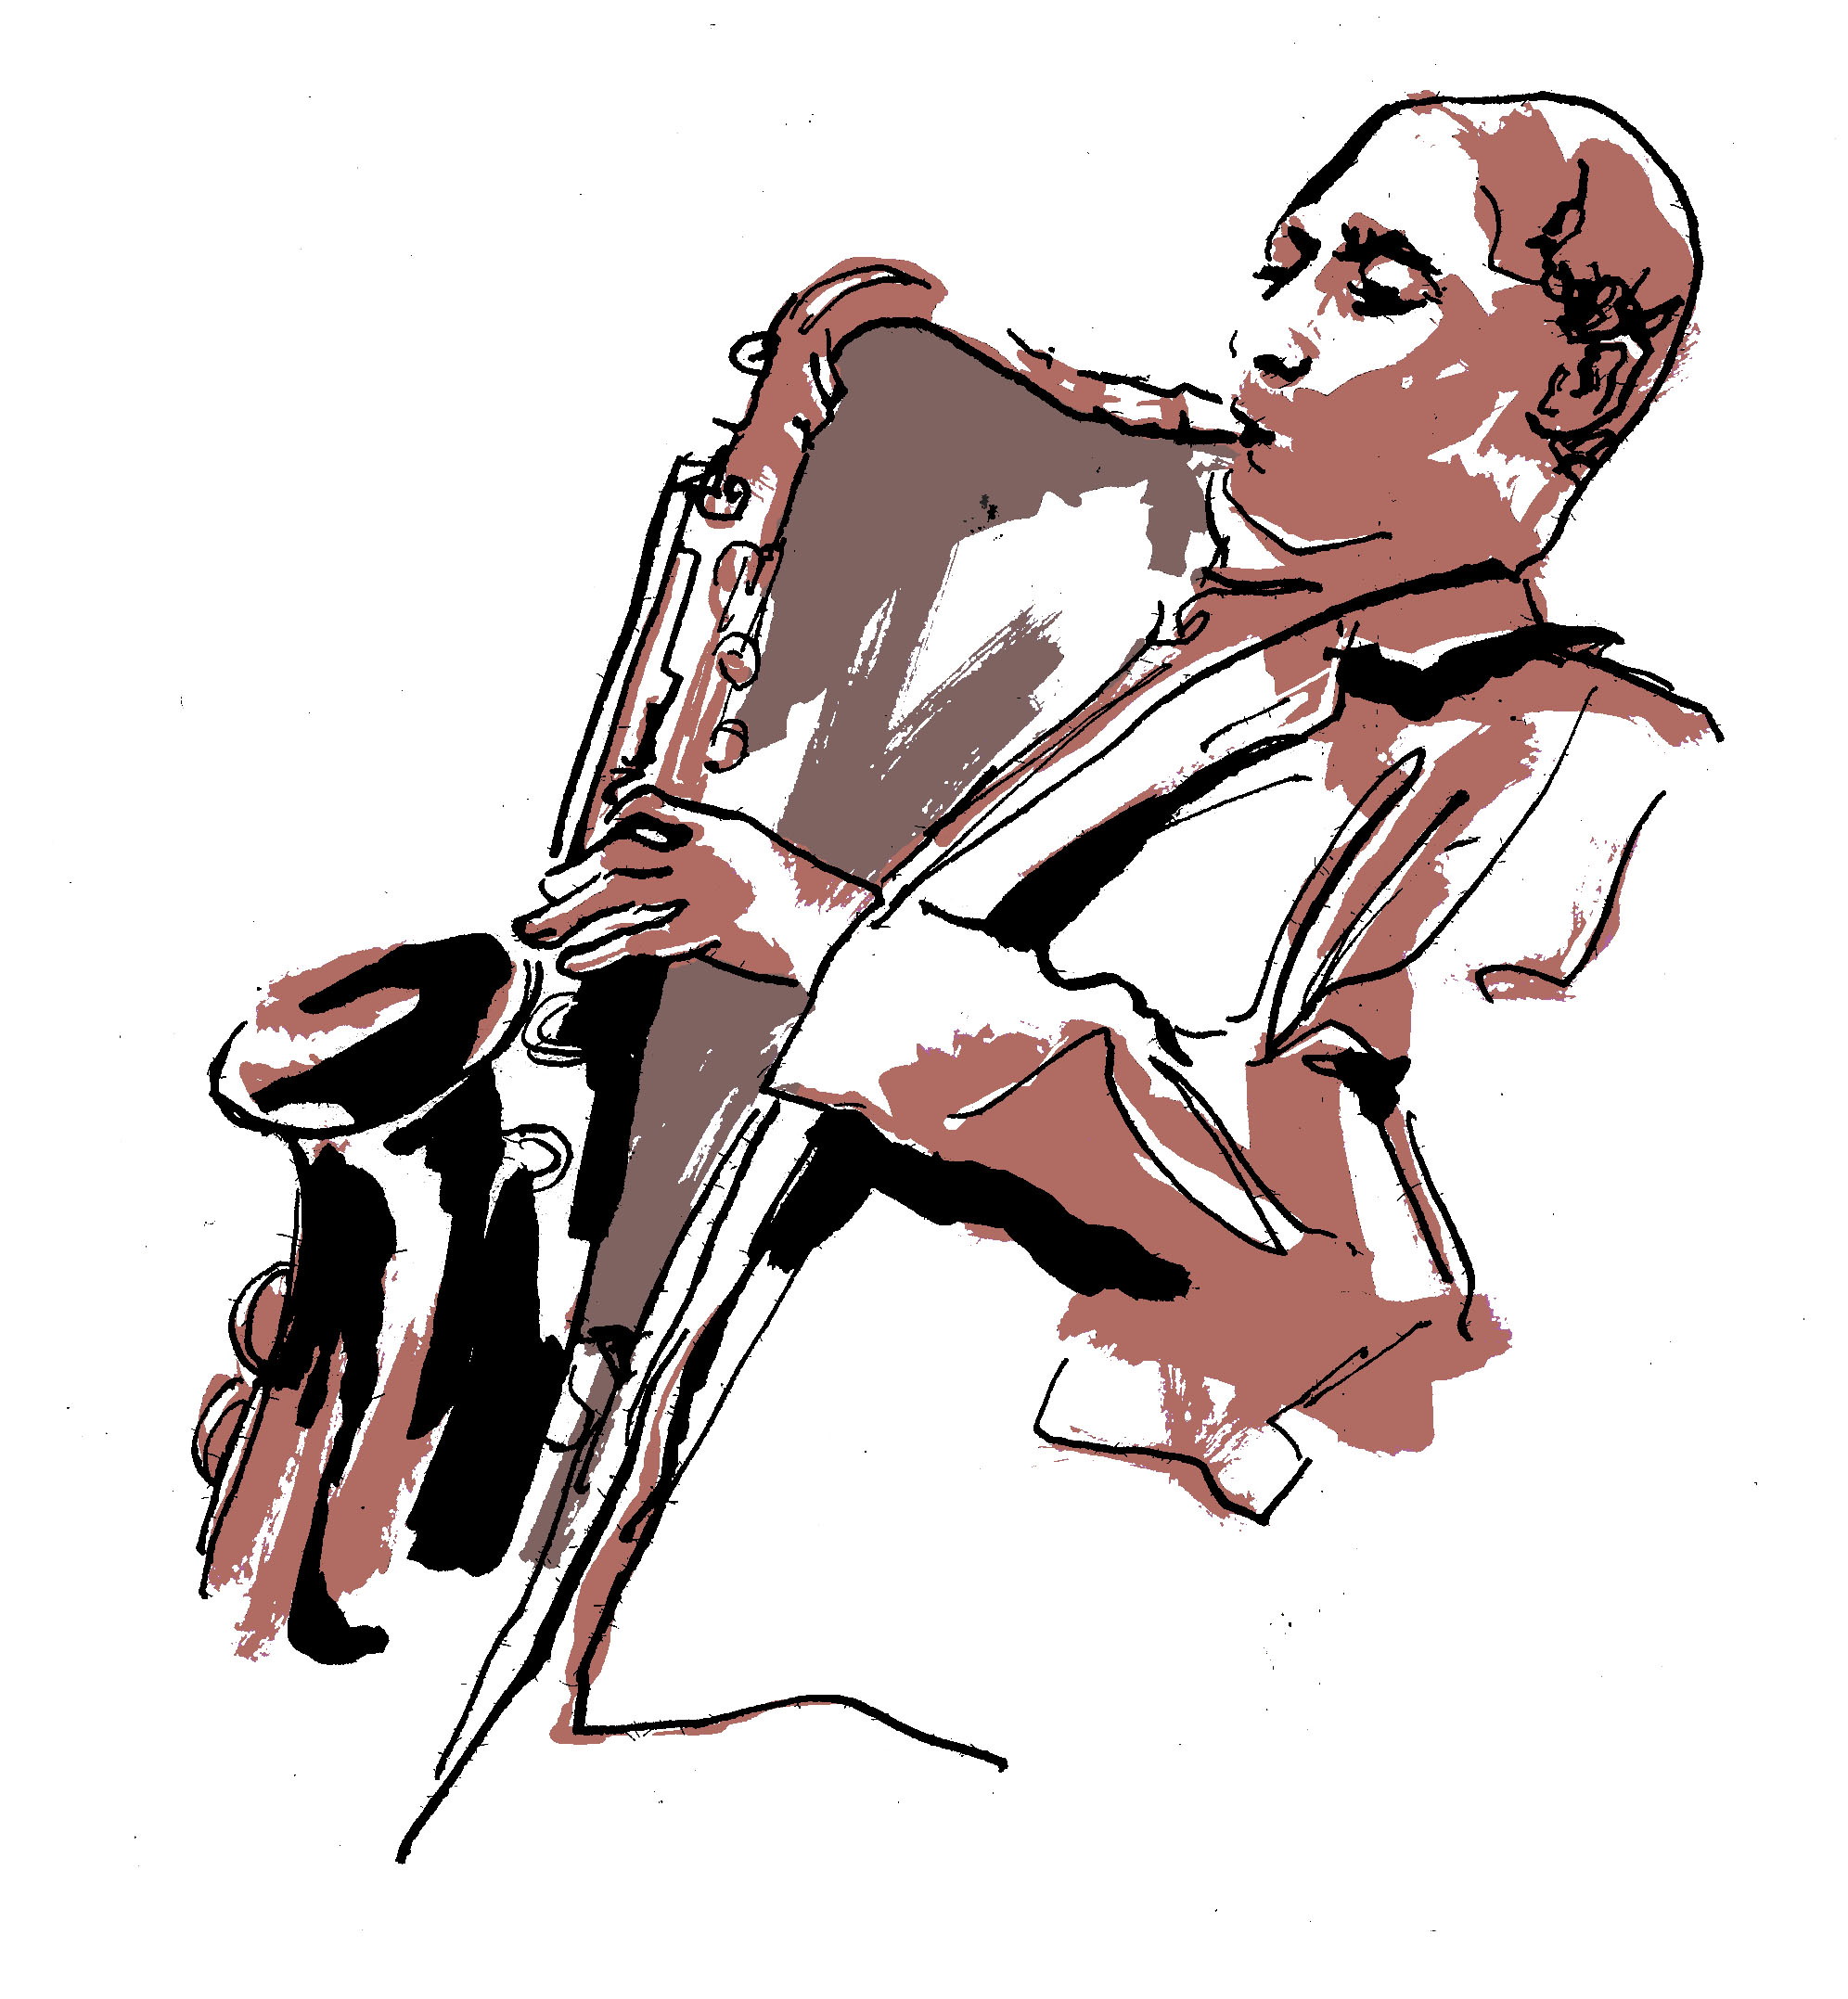 zd Jazz 5